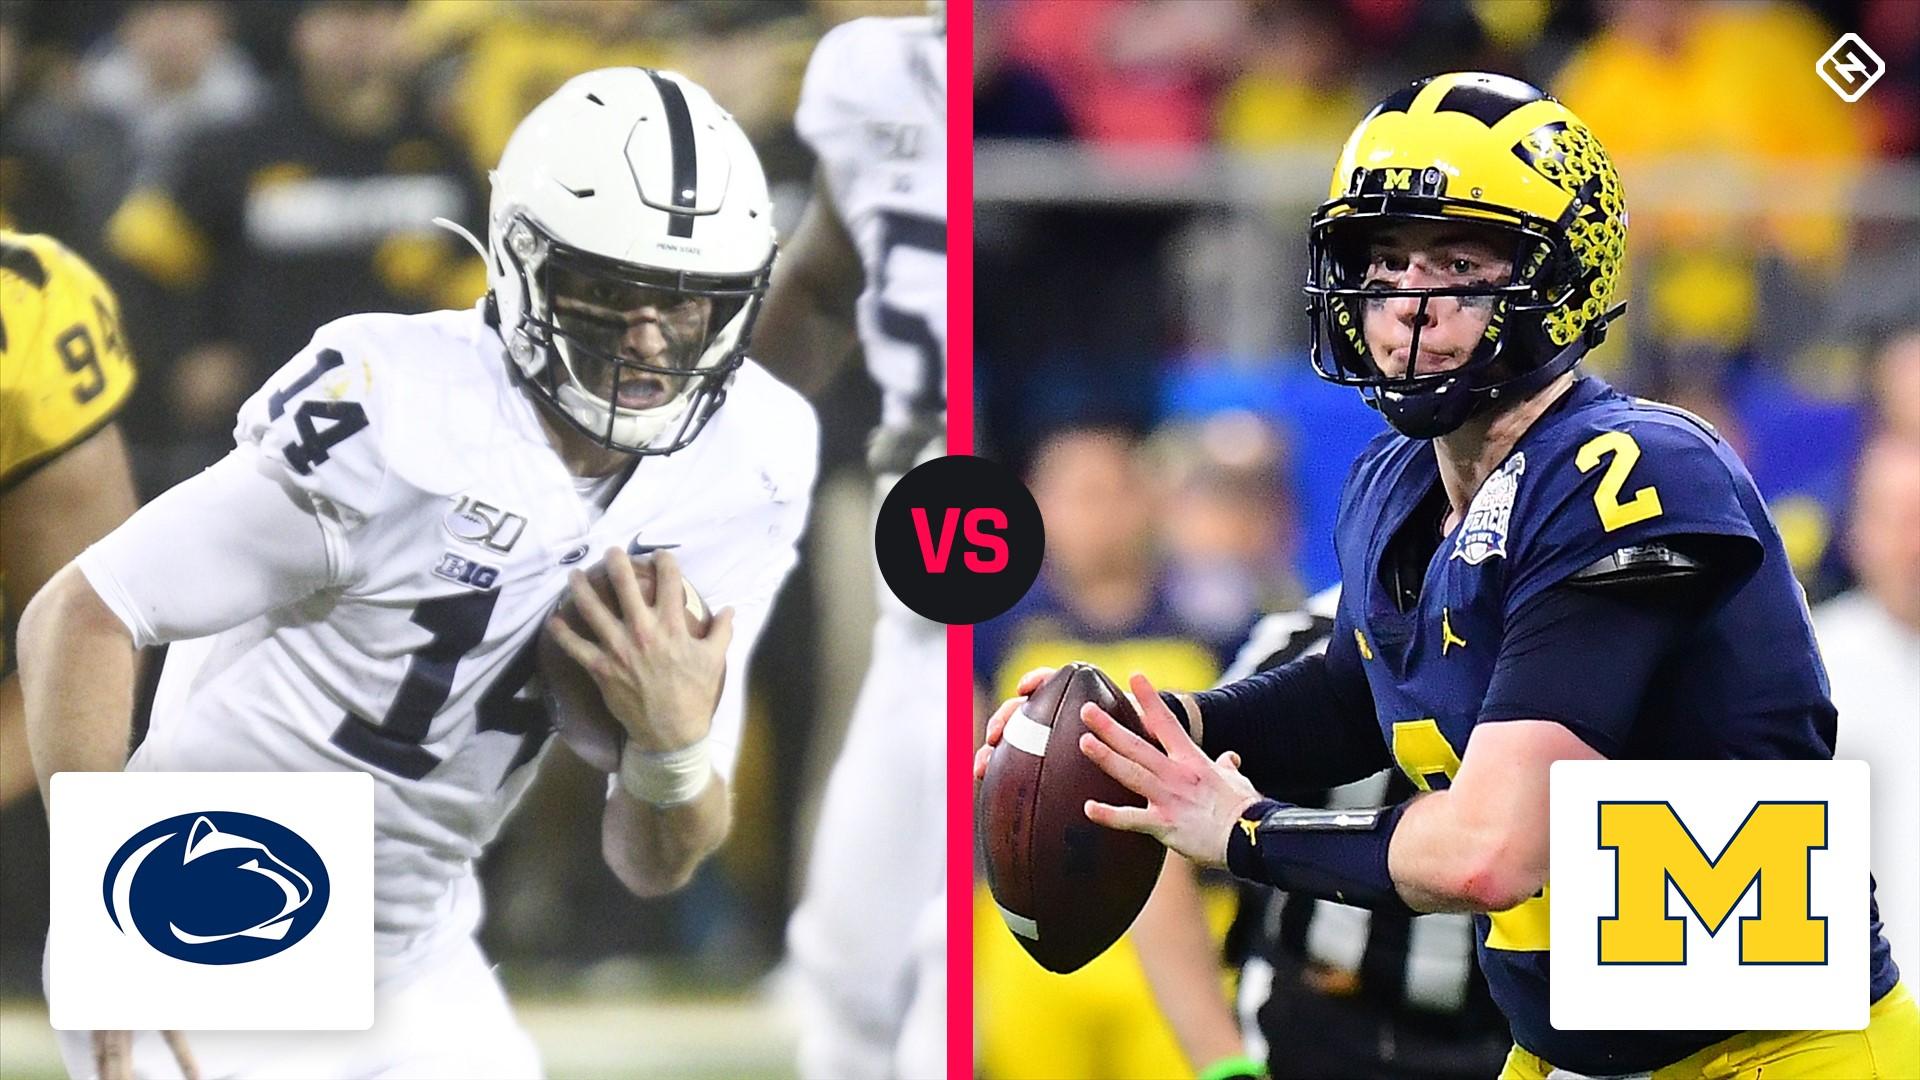 Penn State vs. Michigan: Live score, updates, highlights from pivotal Big Ten matchup